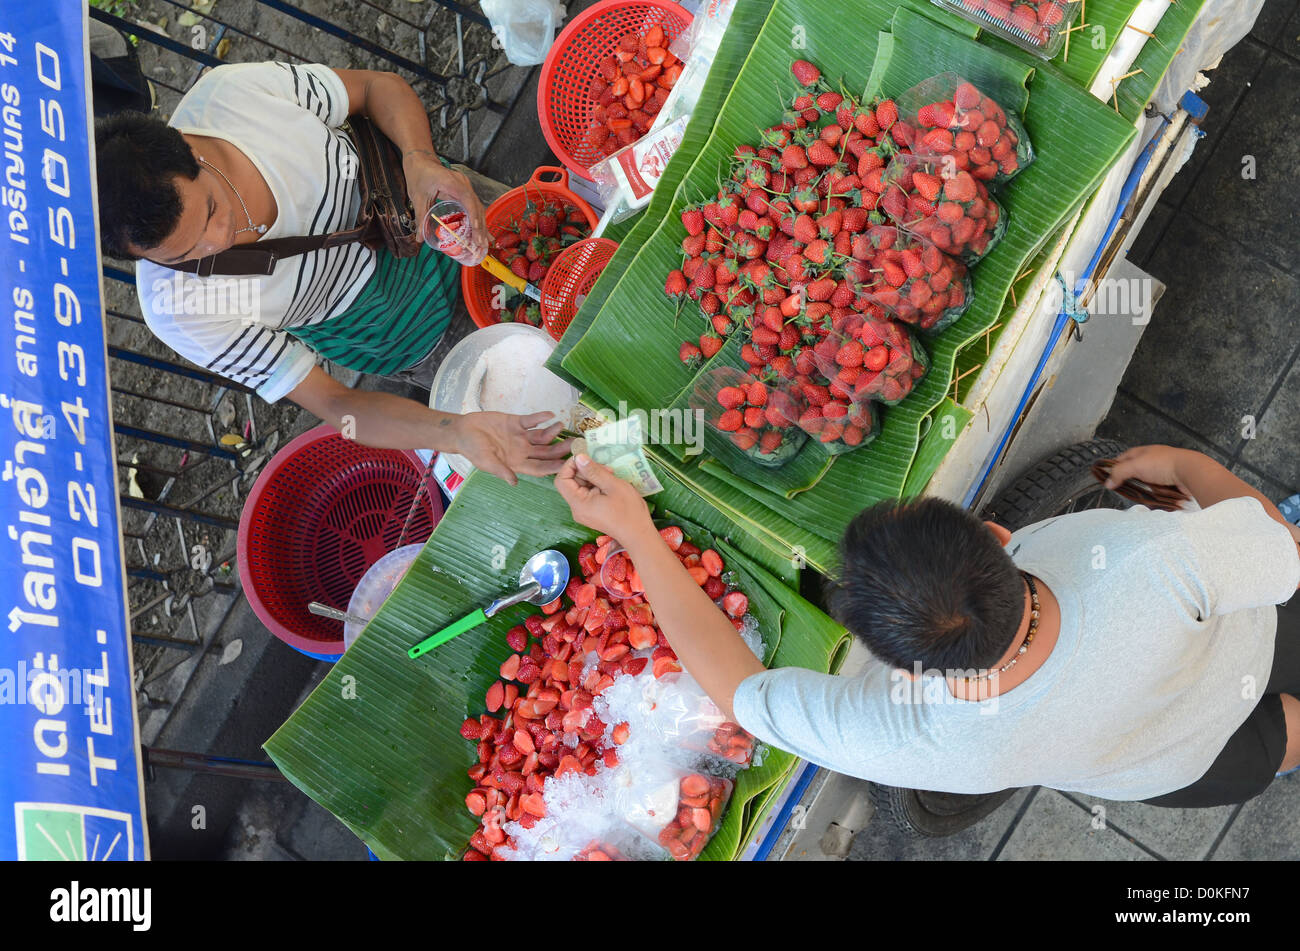 A shopper buying strawberries at Chatuchak market in Bangkok, Thailand. - Stock Image